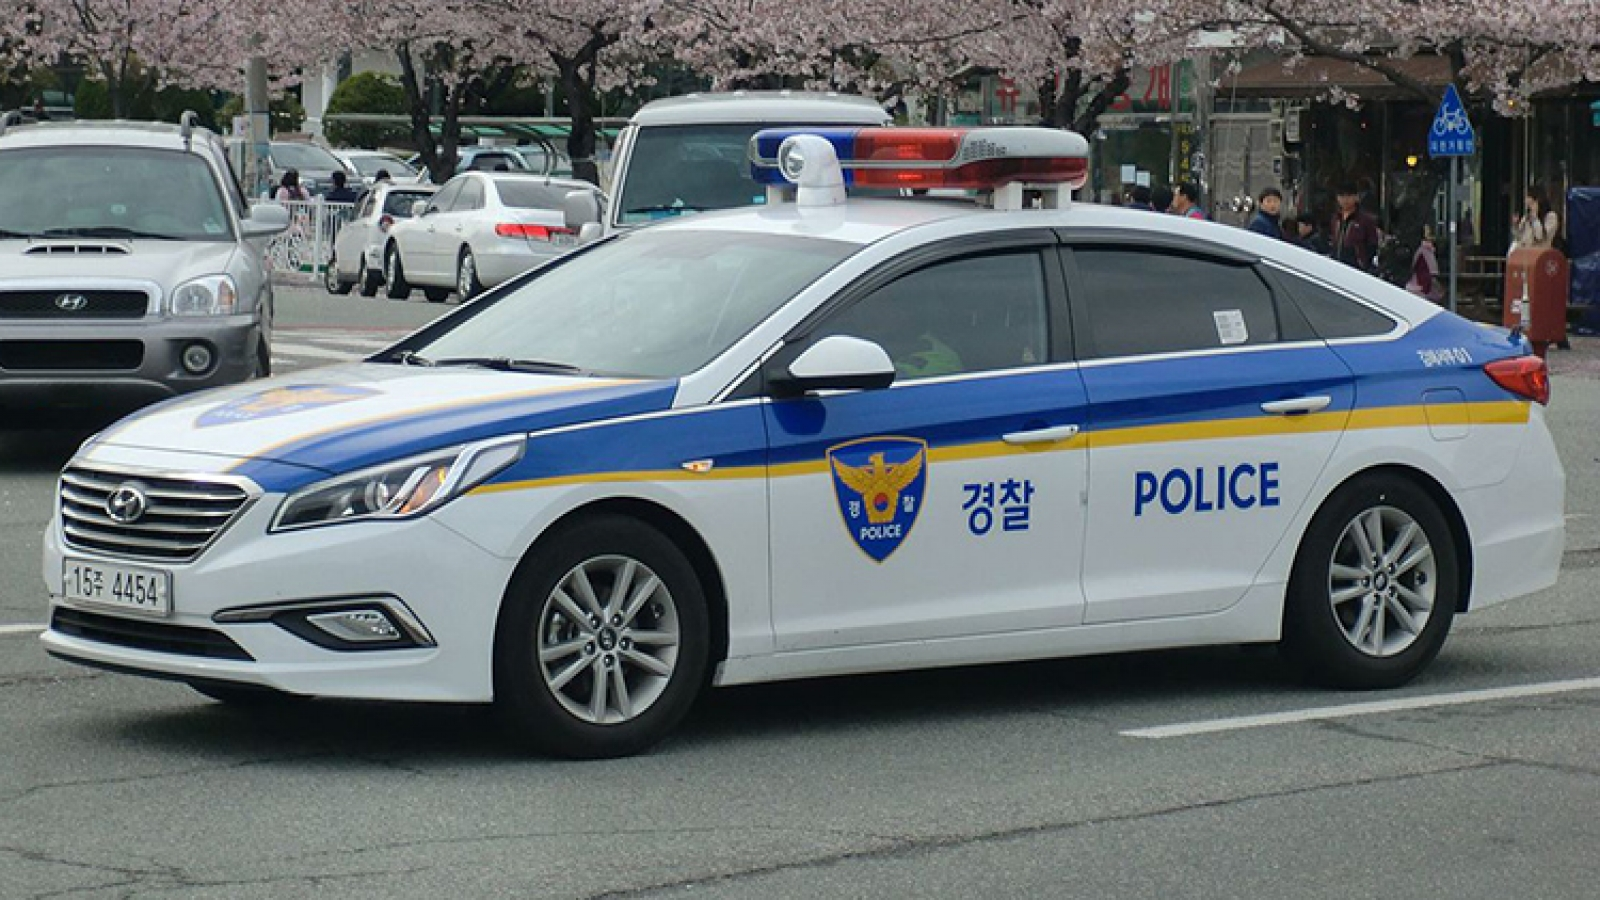 سوناتا هیبریدی پلیس -اجاره خودرو -اجاره ماشین